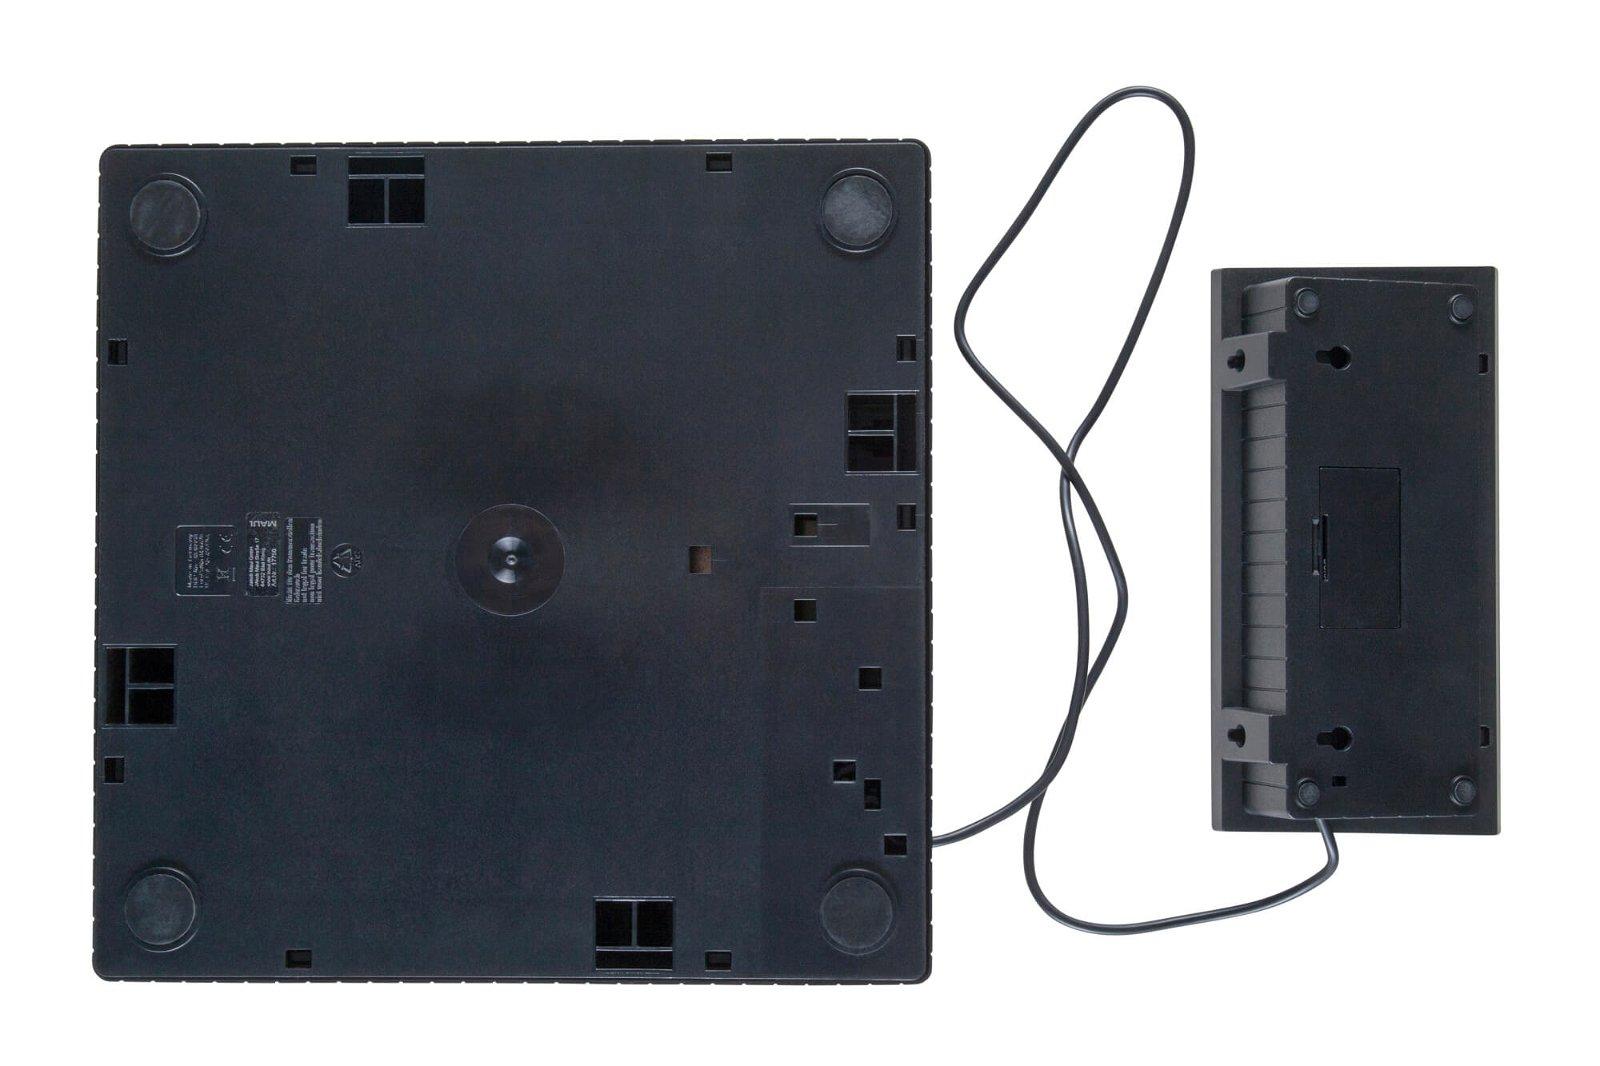 Paketwaage MAULparcel, 50 kg, Bedienpult, Edelstahlplatte, schwarz